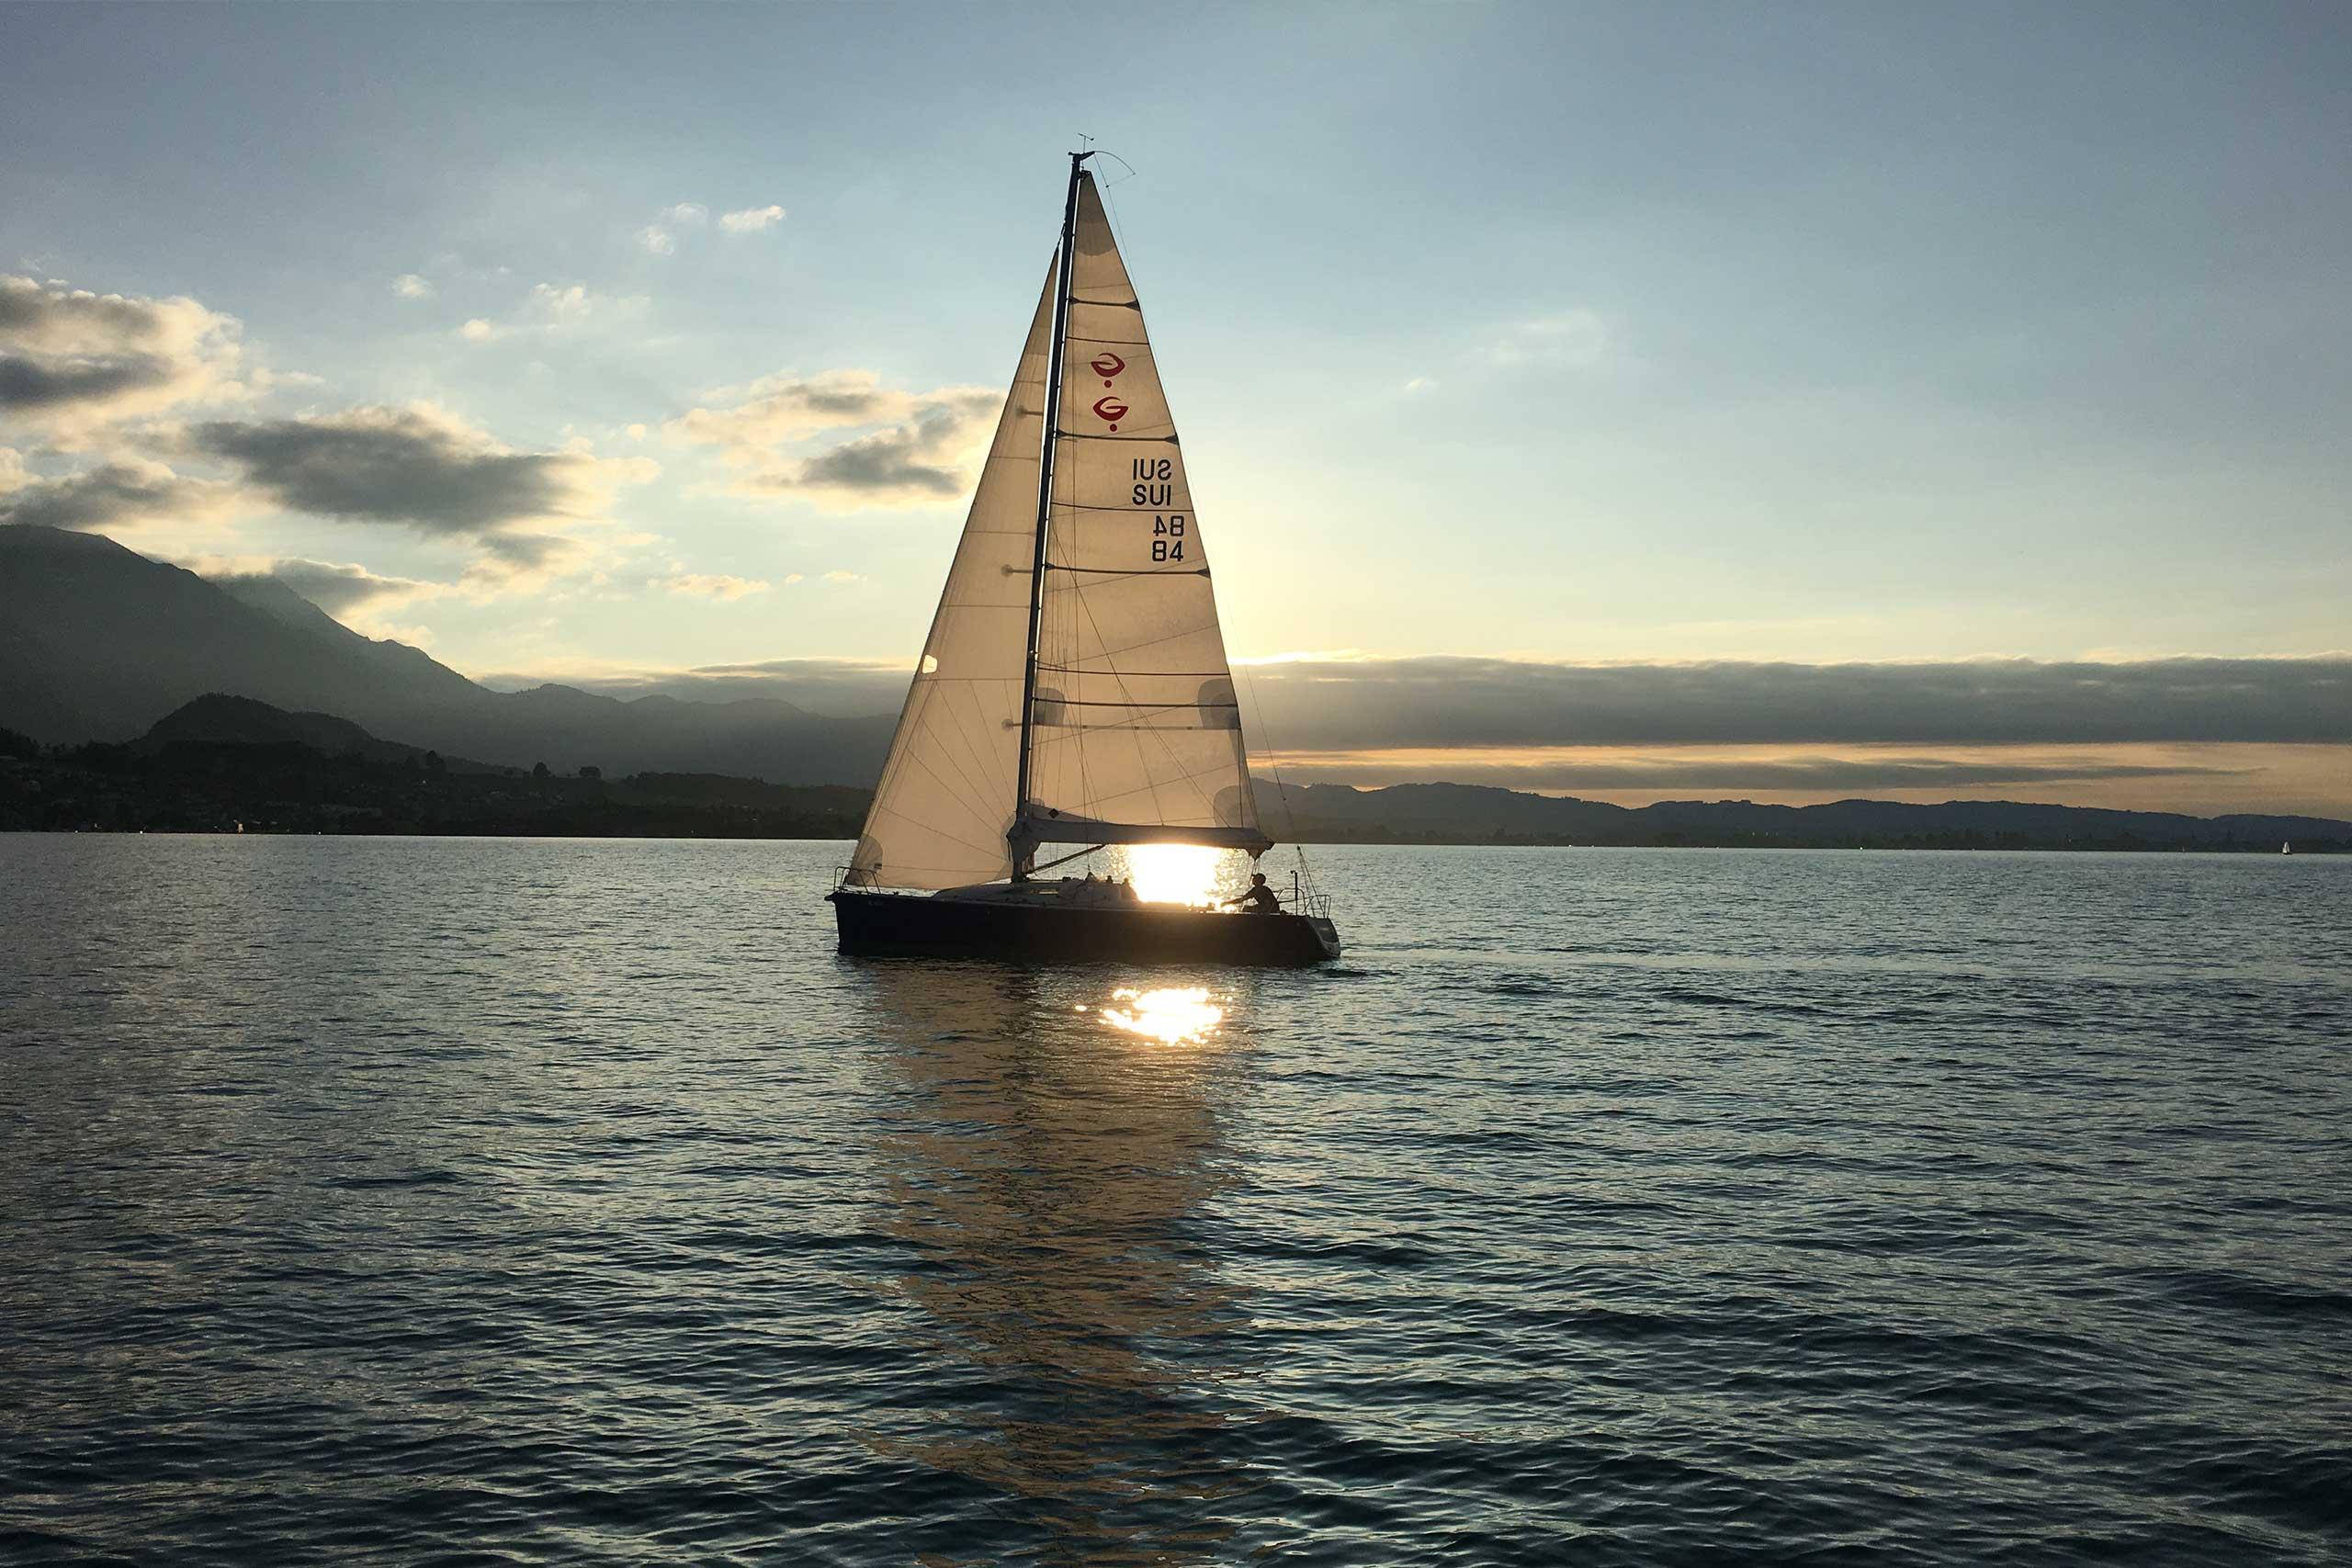 segelschule-thunersee-gaeste-segeln-segelschiff-abendsonne.jpg